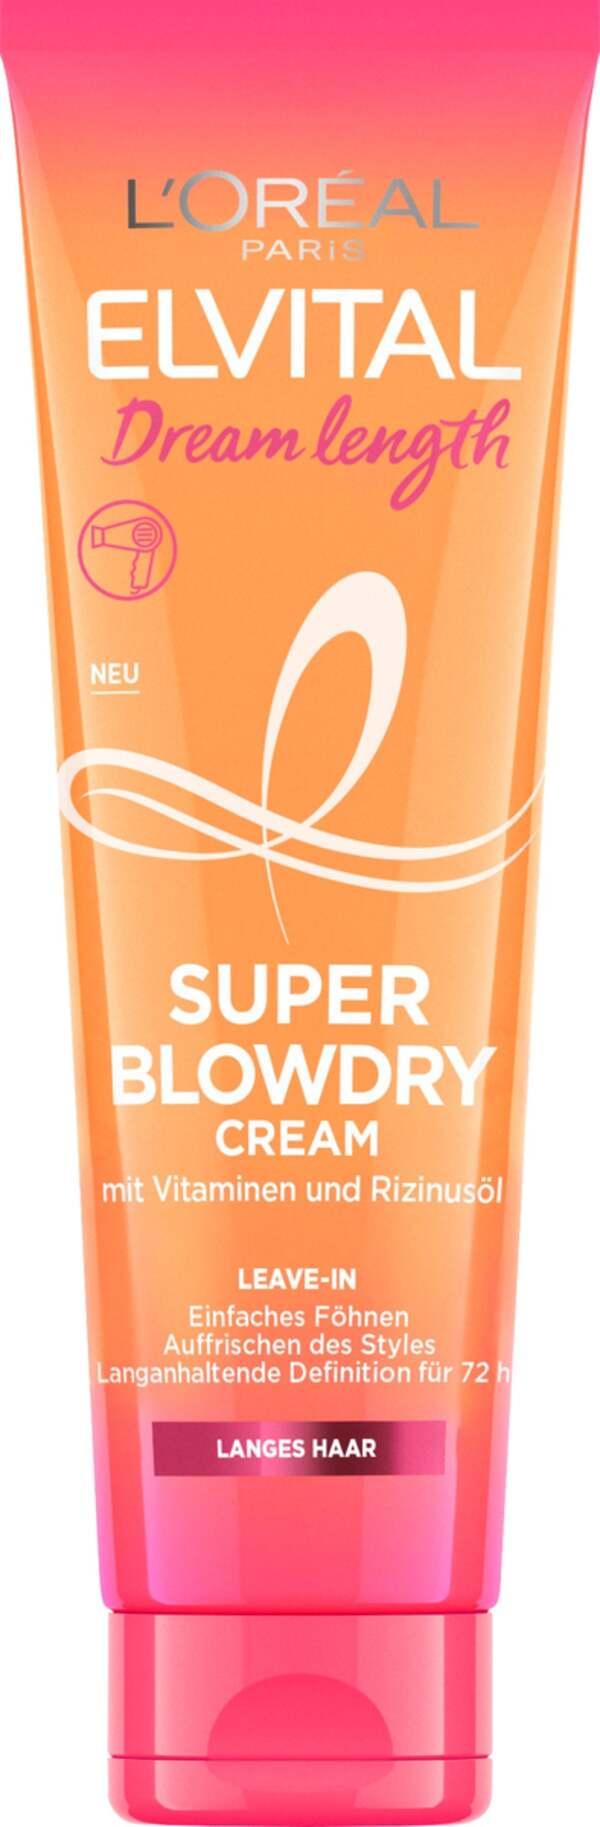 L'Oréal Paris Elvital Dream Length Super Blowdry Cream